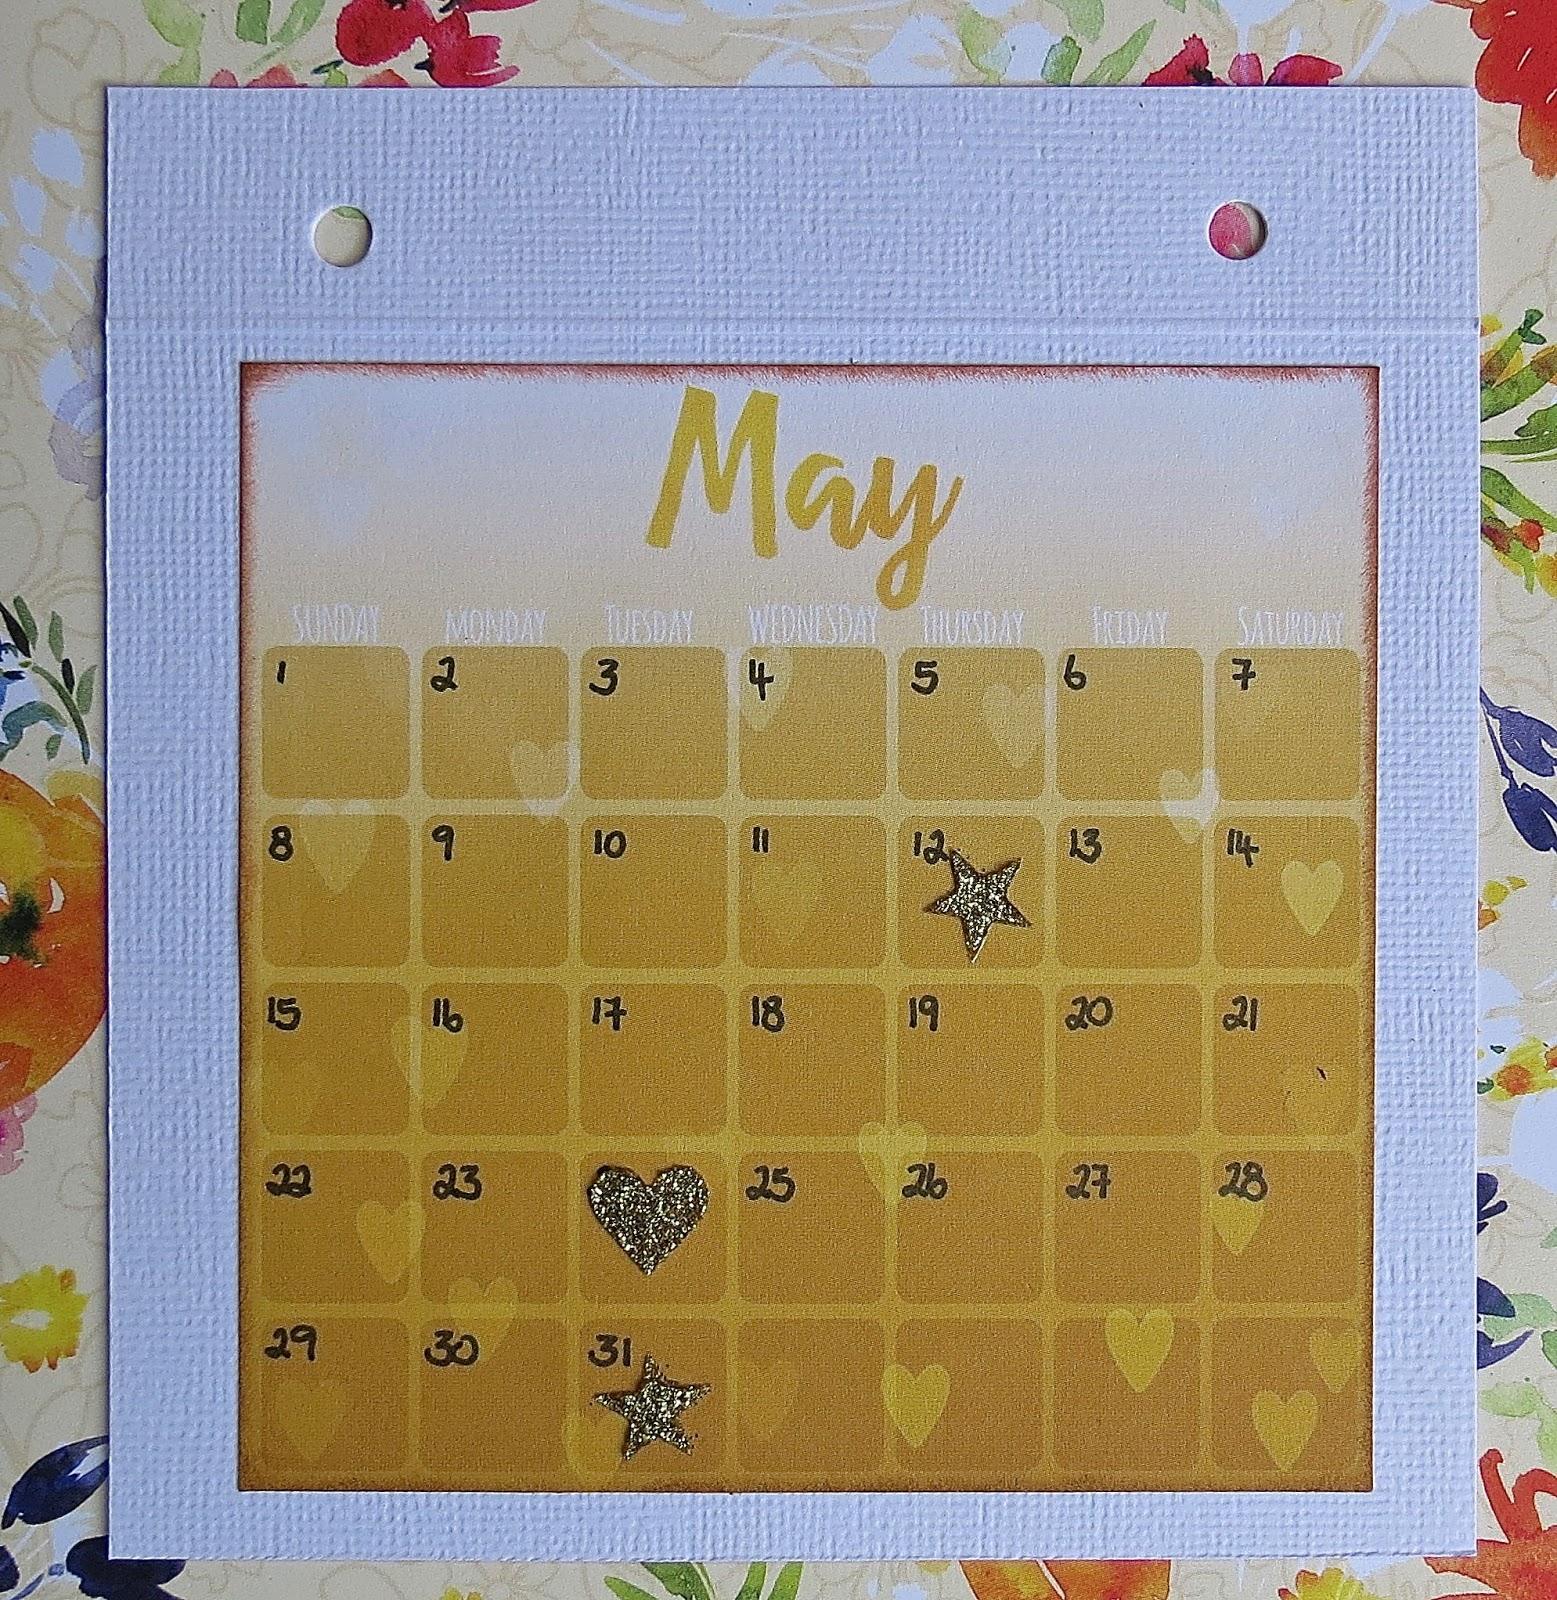 May Calendar Girl Book : Small but powerful calendar girl birthday book bobunny dt